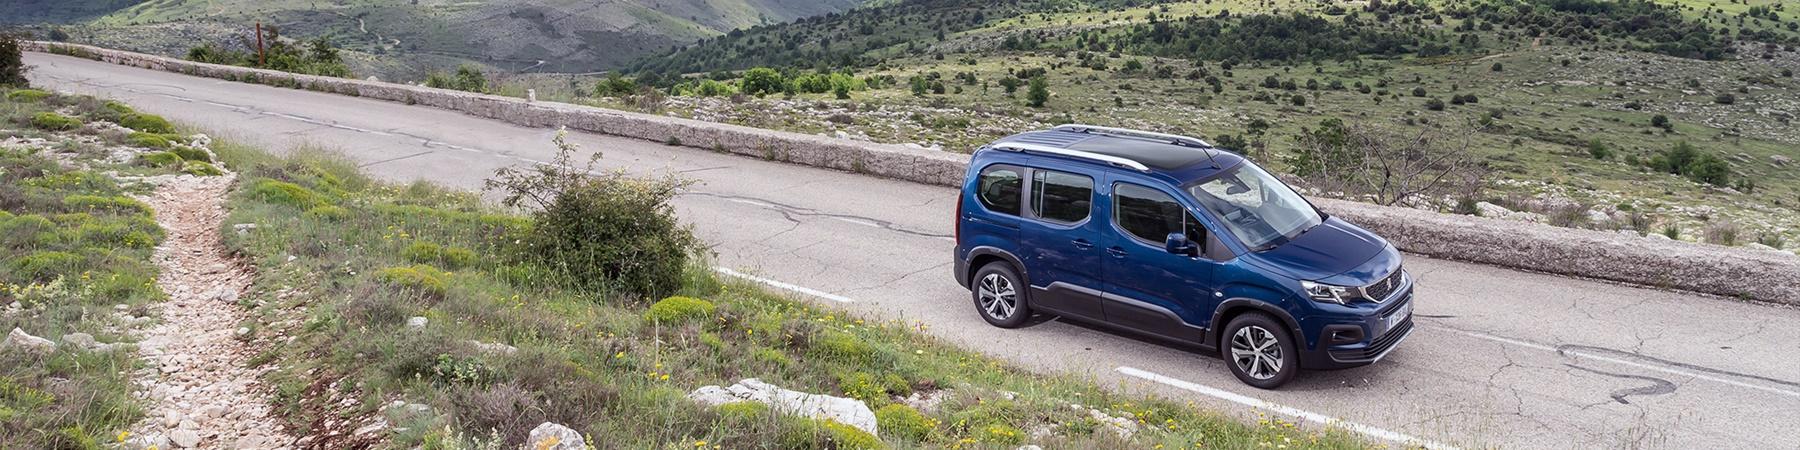 Peugeot Rifter 50kWh 240 km actieradius